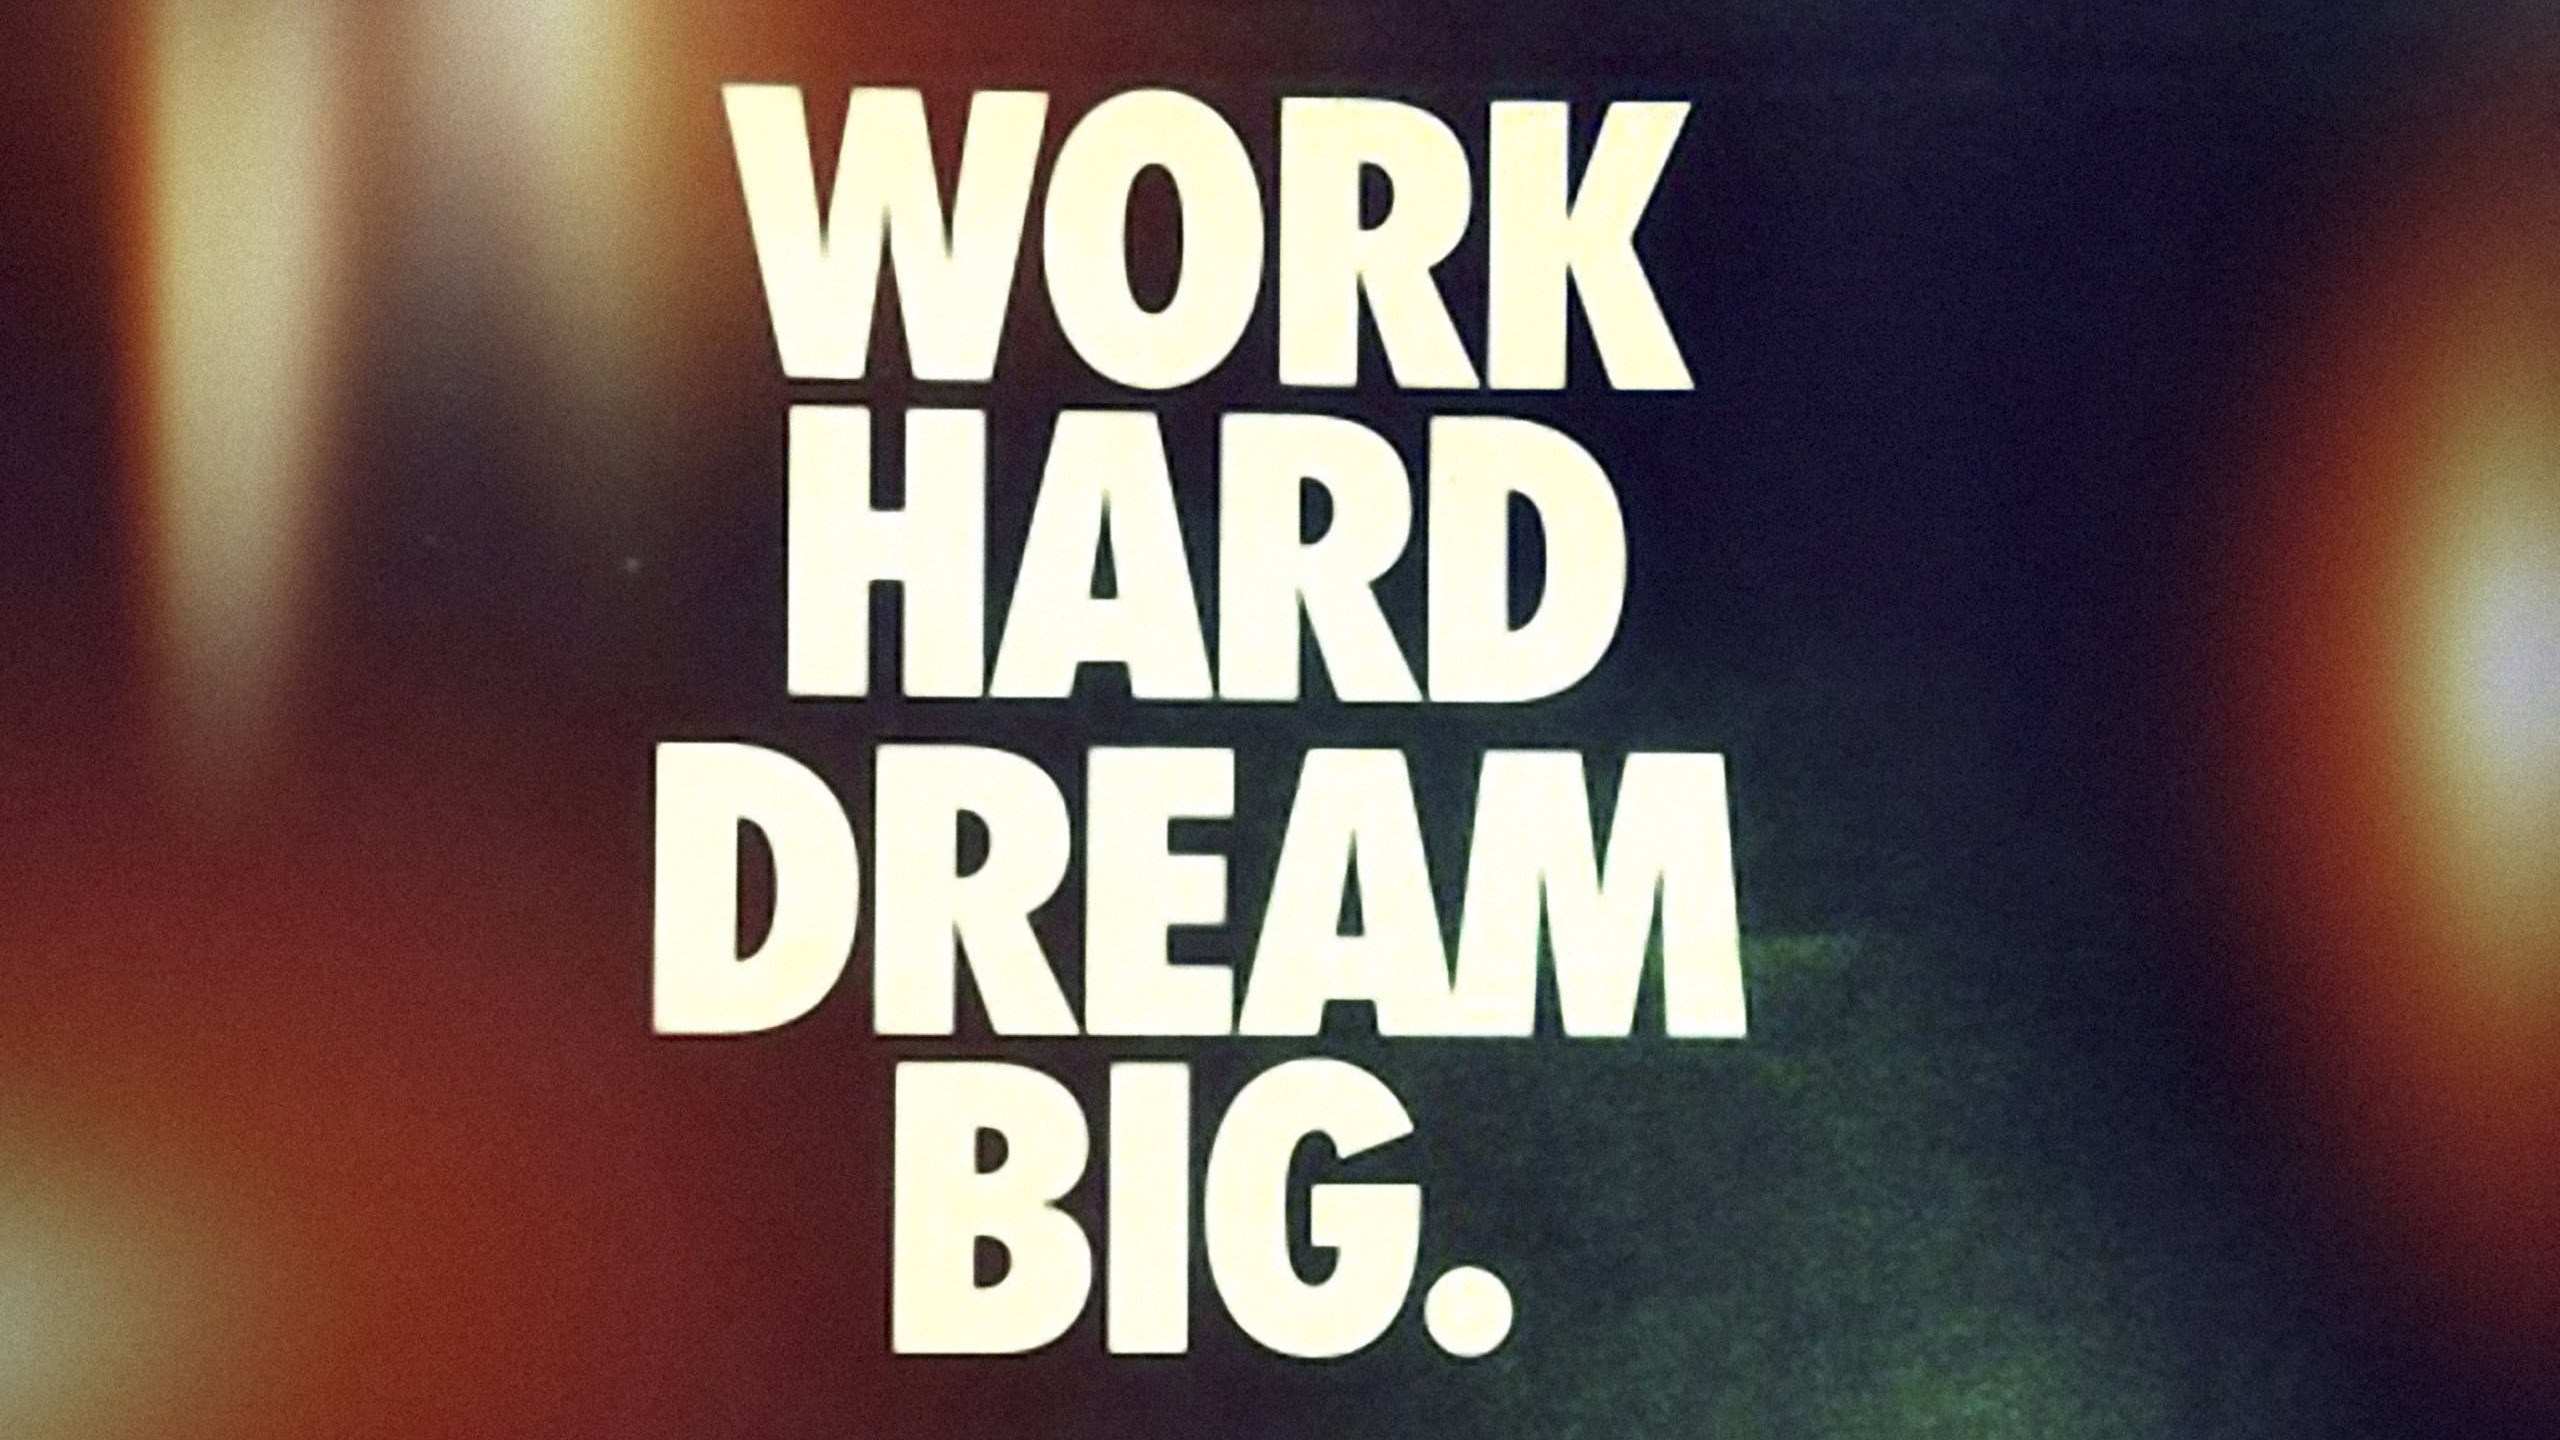 work hard dream big wallpaper 2560x1440   Magic4Wallscom 2560x1440